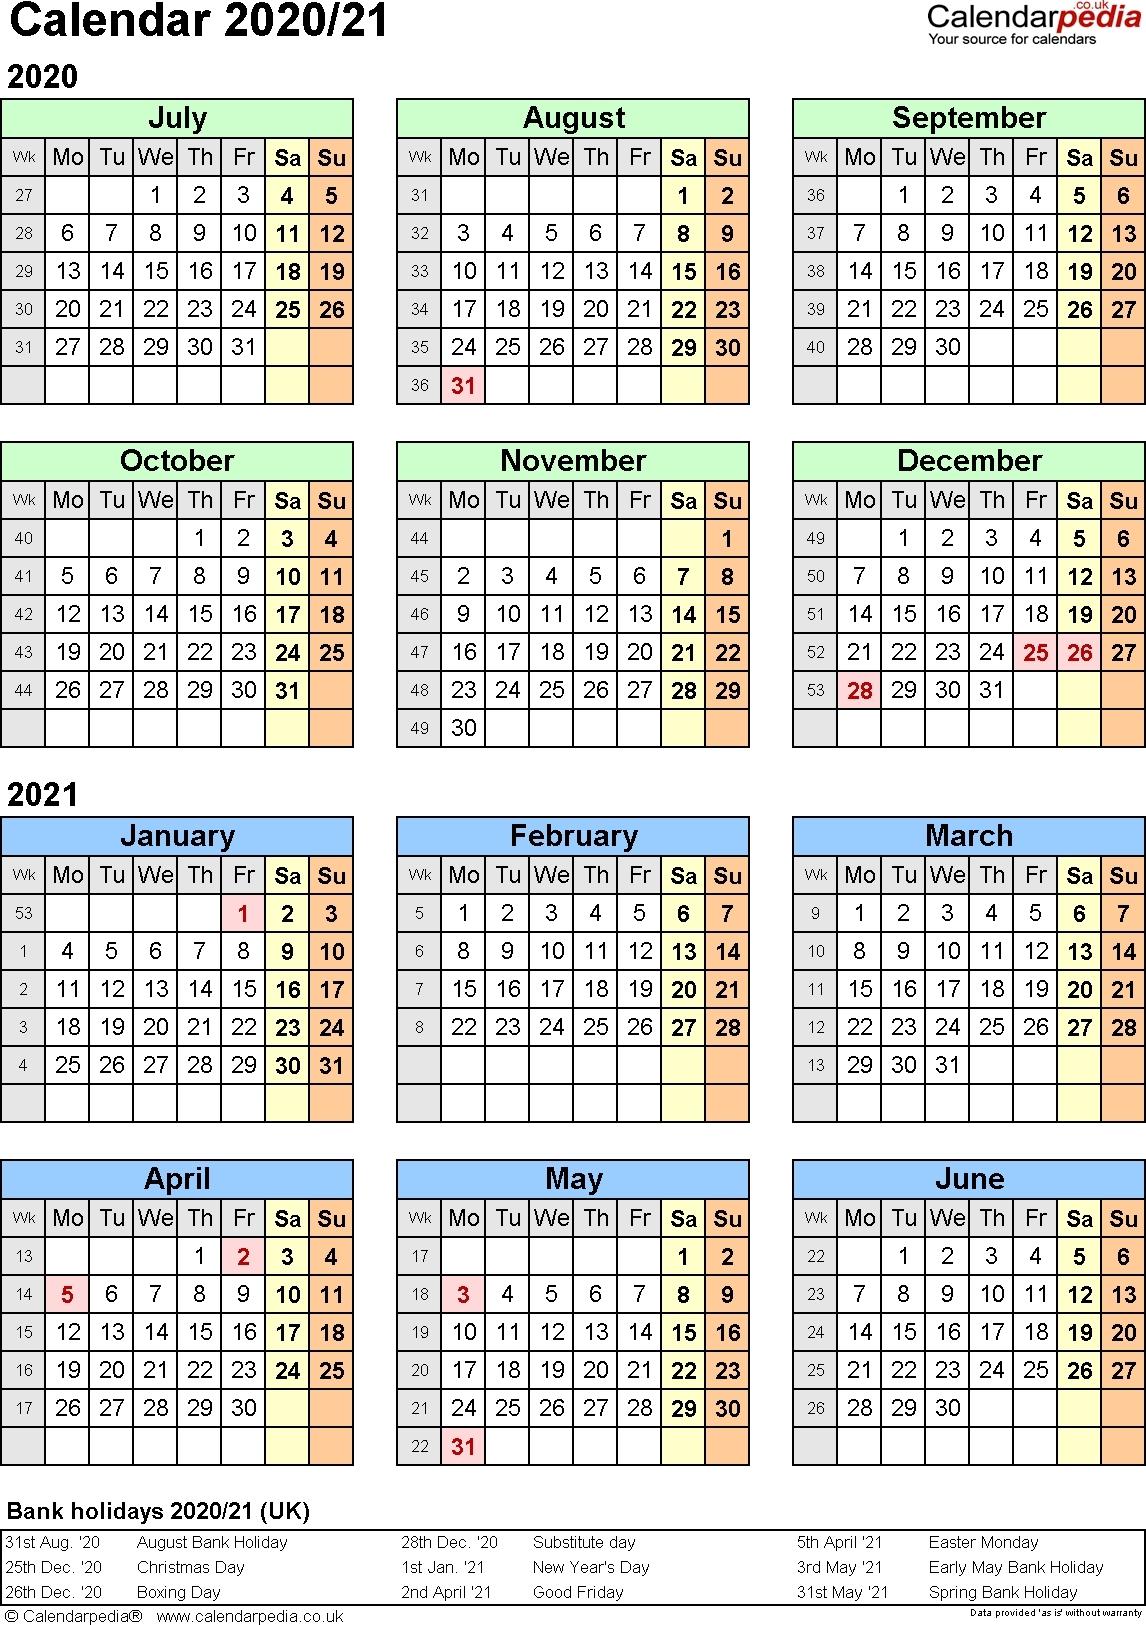 Dod Civilian Pay Calendar 2020 throughout Federal Civilian Pay Calendar 2020